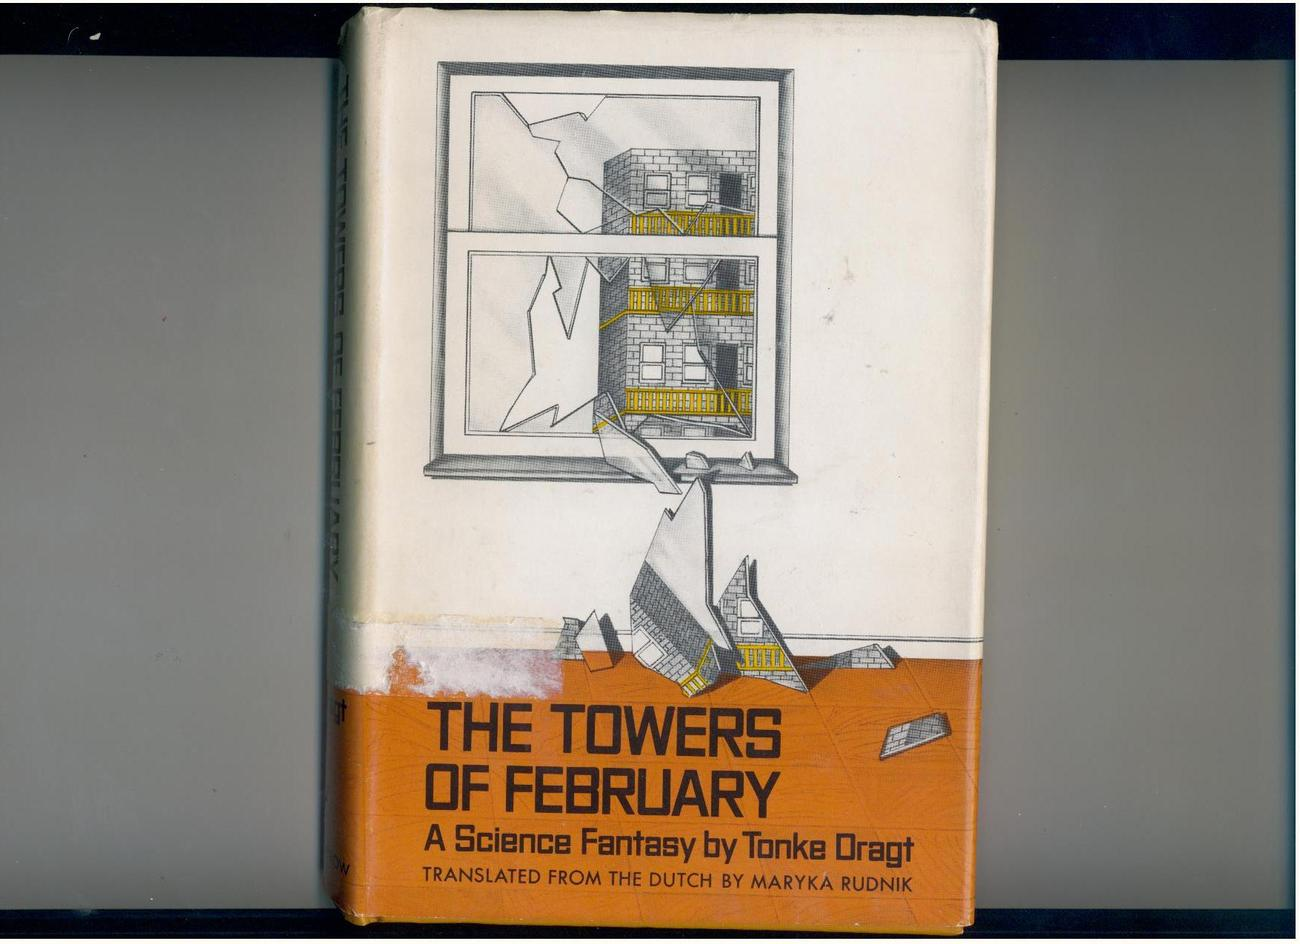 Tonke Dragt - TOWERS OF FEBRUARY - 1975 - U.S. 1st - scarce science fantasy